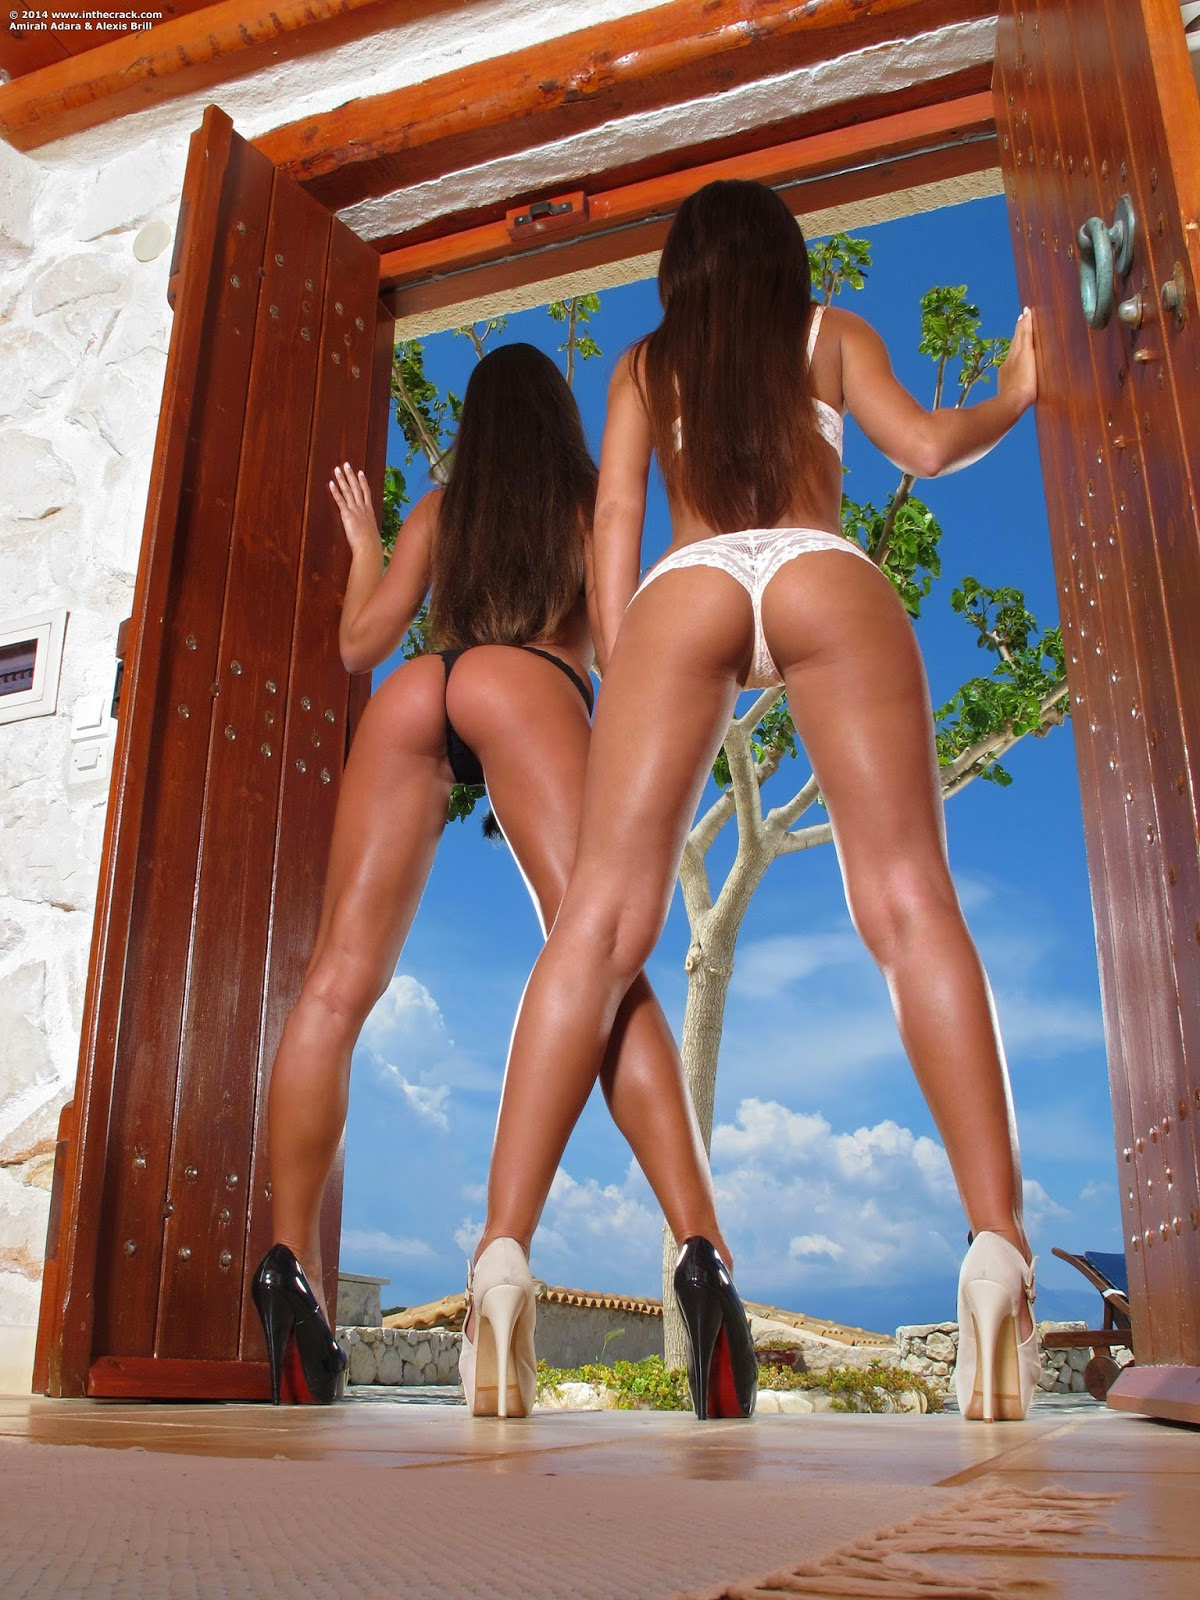 Amirah Adara And Alexis Brill The Crack 987 Photo Set